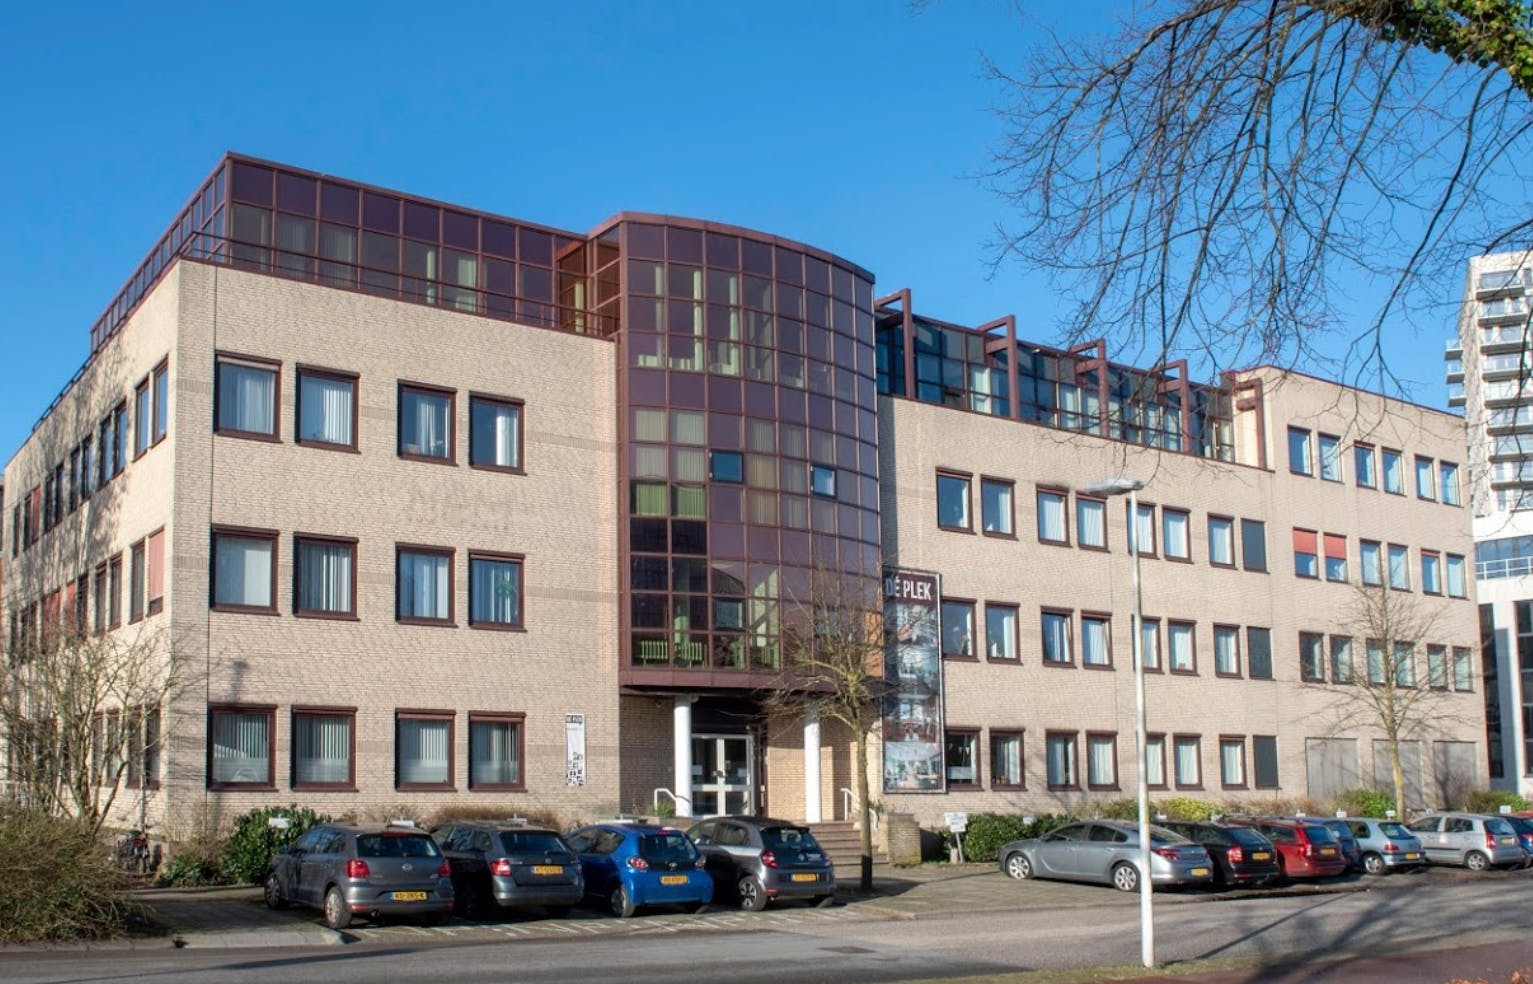 Centrum Hecht - Psychotherapeutische praktijk